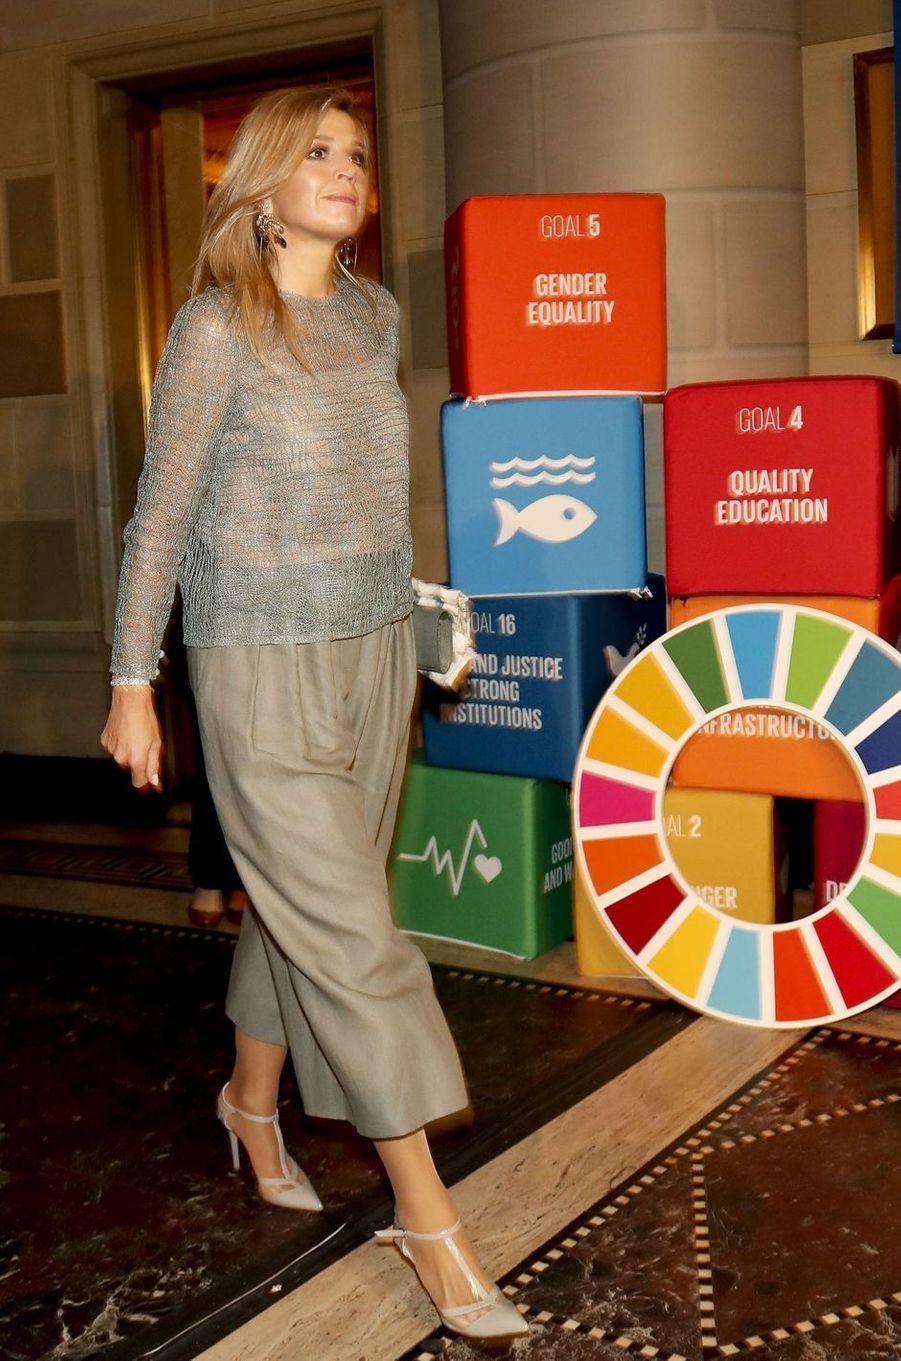 La reine Maxima des Pays-Bas au dîner des Goalkeepers Global Goals Awards à New-York, le 19 septembre 2017